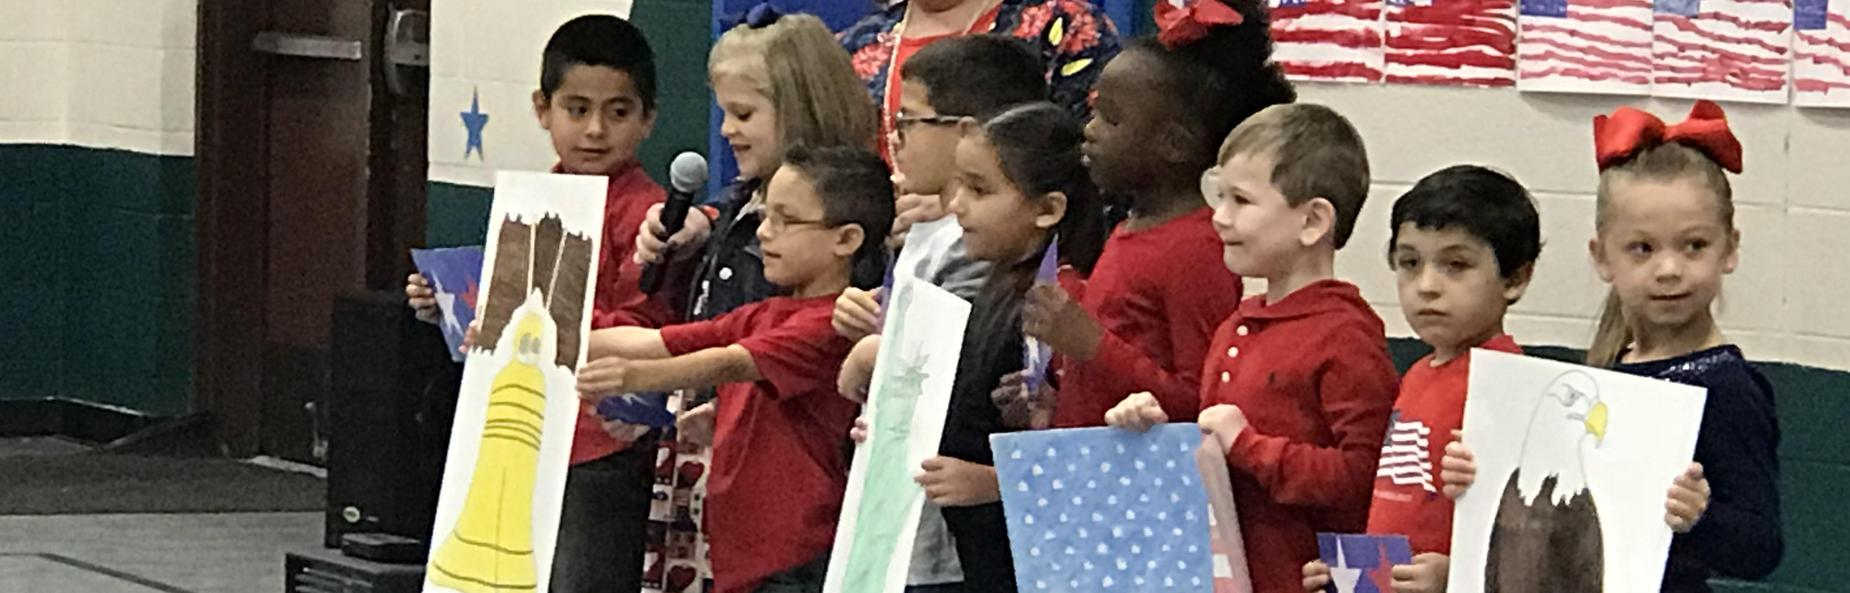 children holding patriotic posters